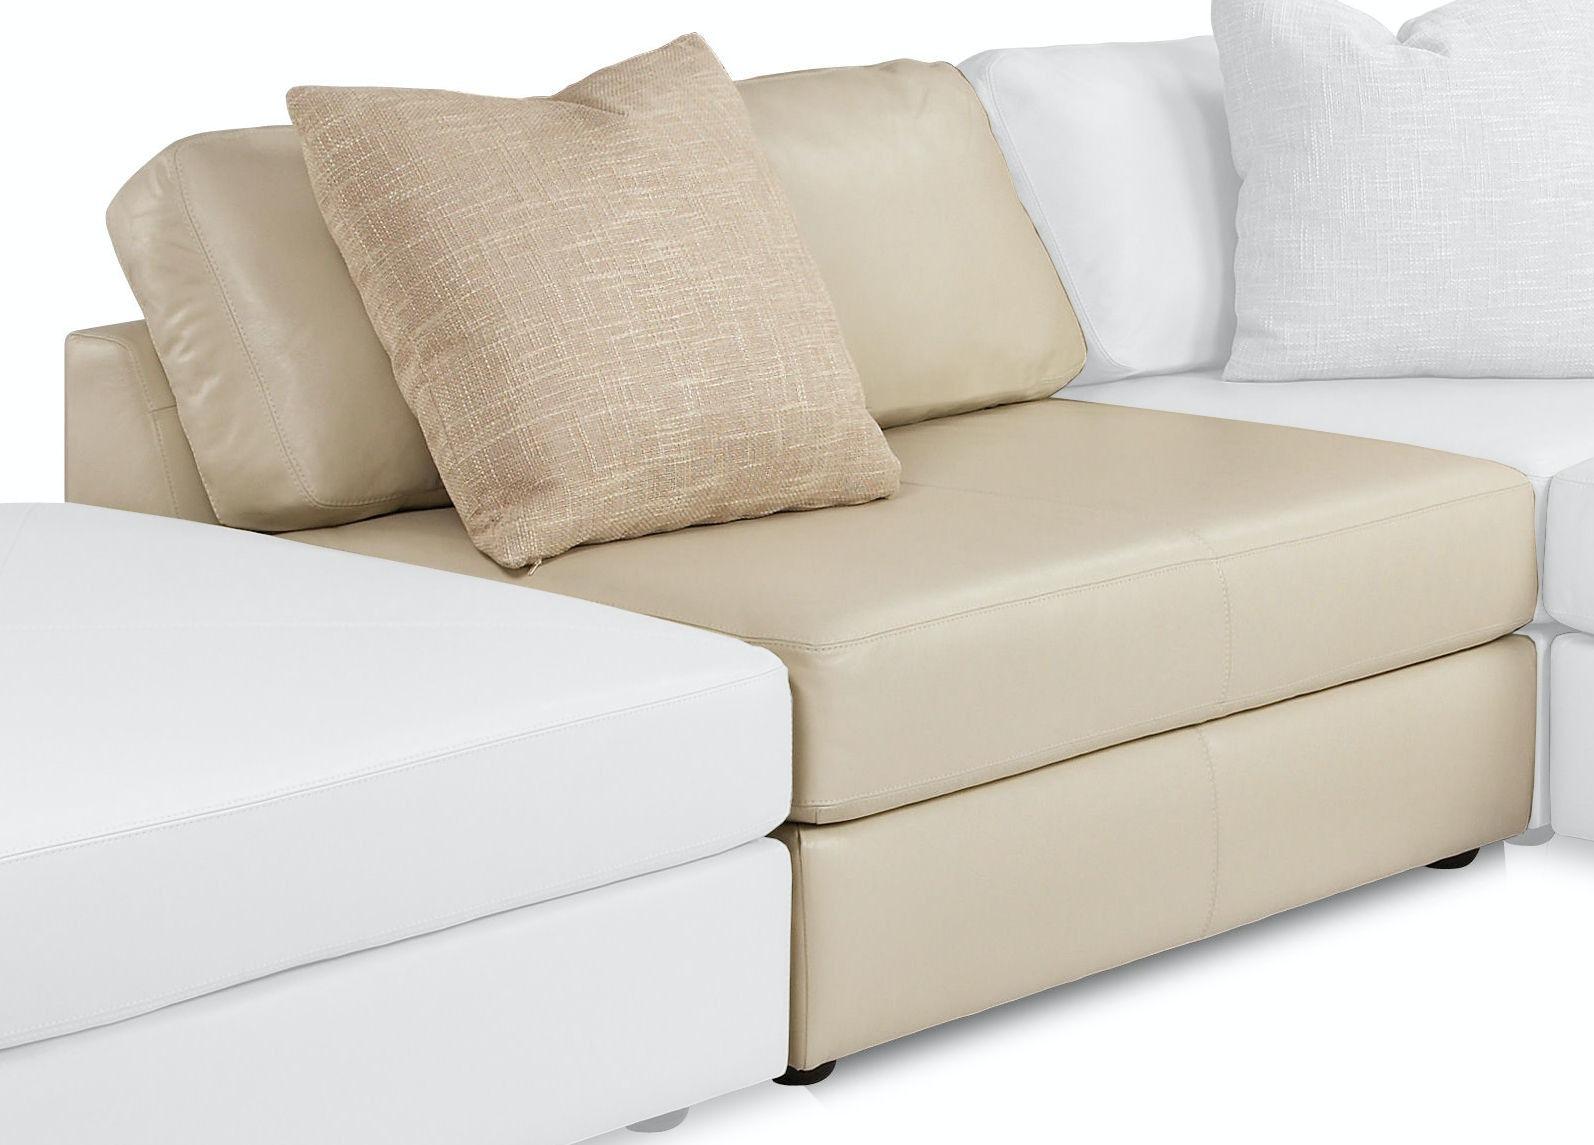 woodley s fine furniture